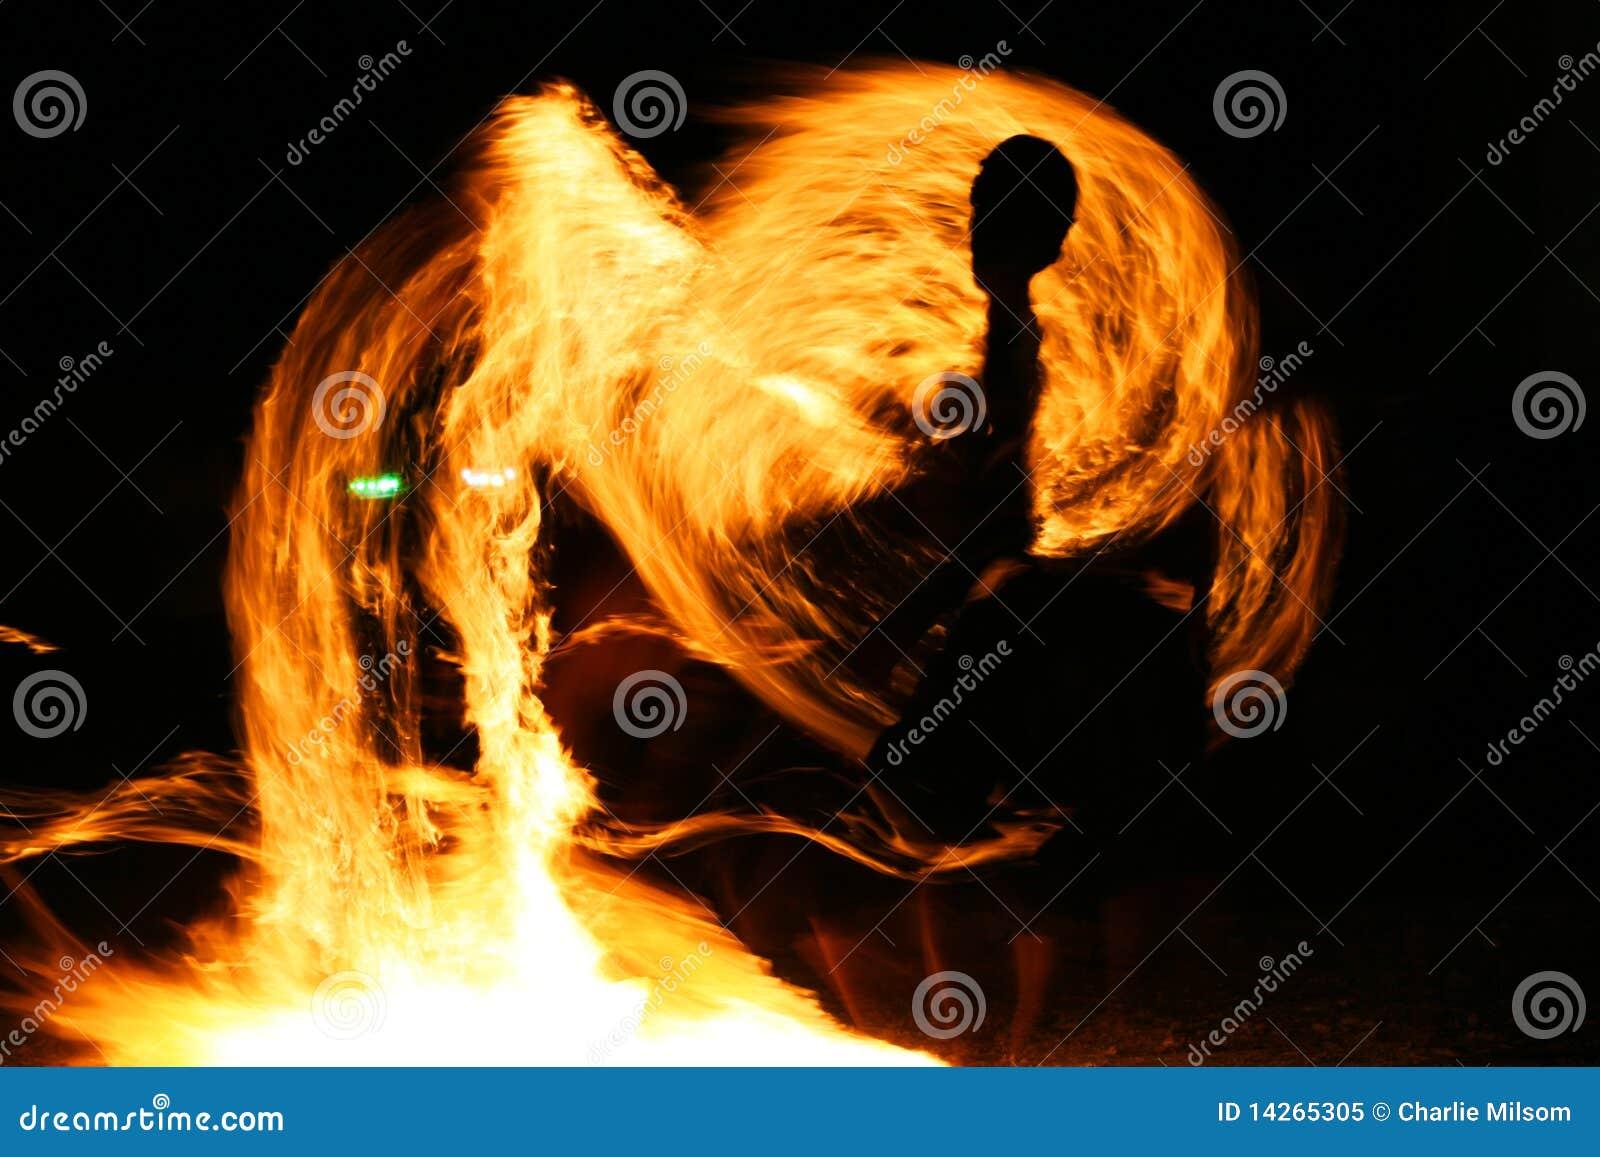 Koh samet Ταϊλάνδη ζογκλέρ πυρκα&gam